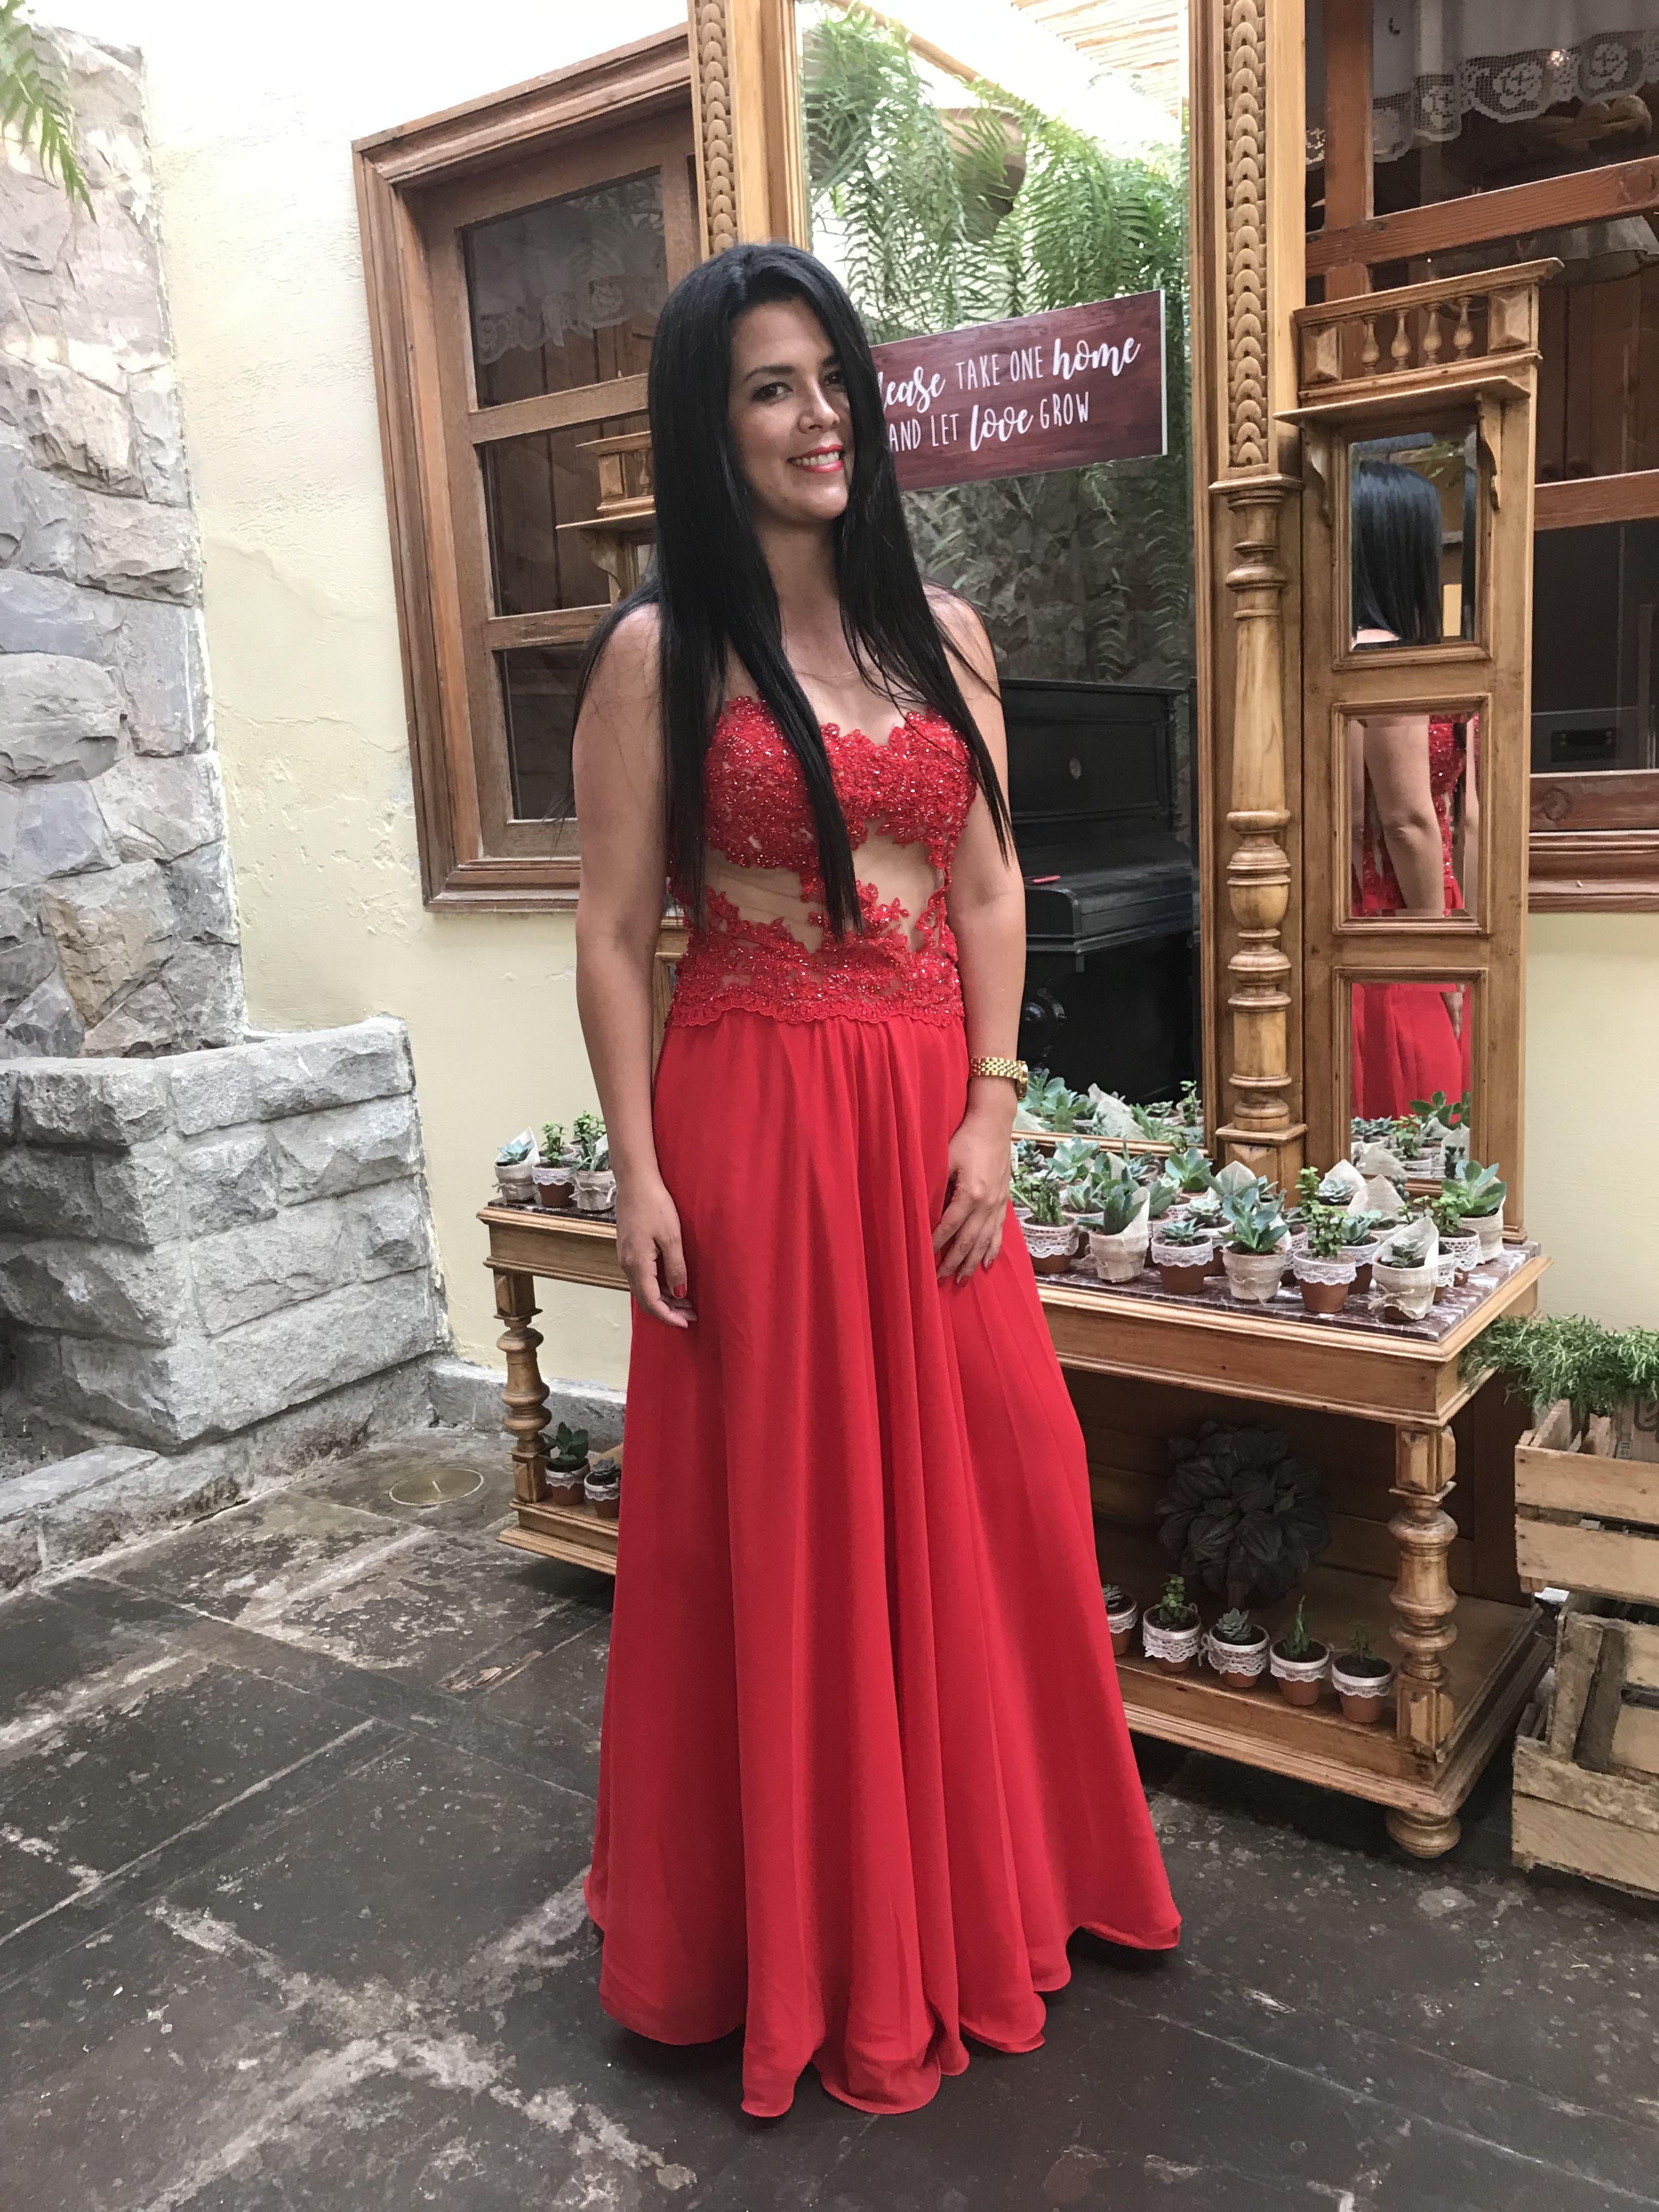 75daf2c3e Pin de Giovanna Milagros en Vestidos de fiesta